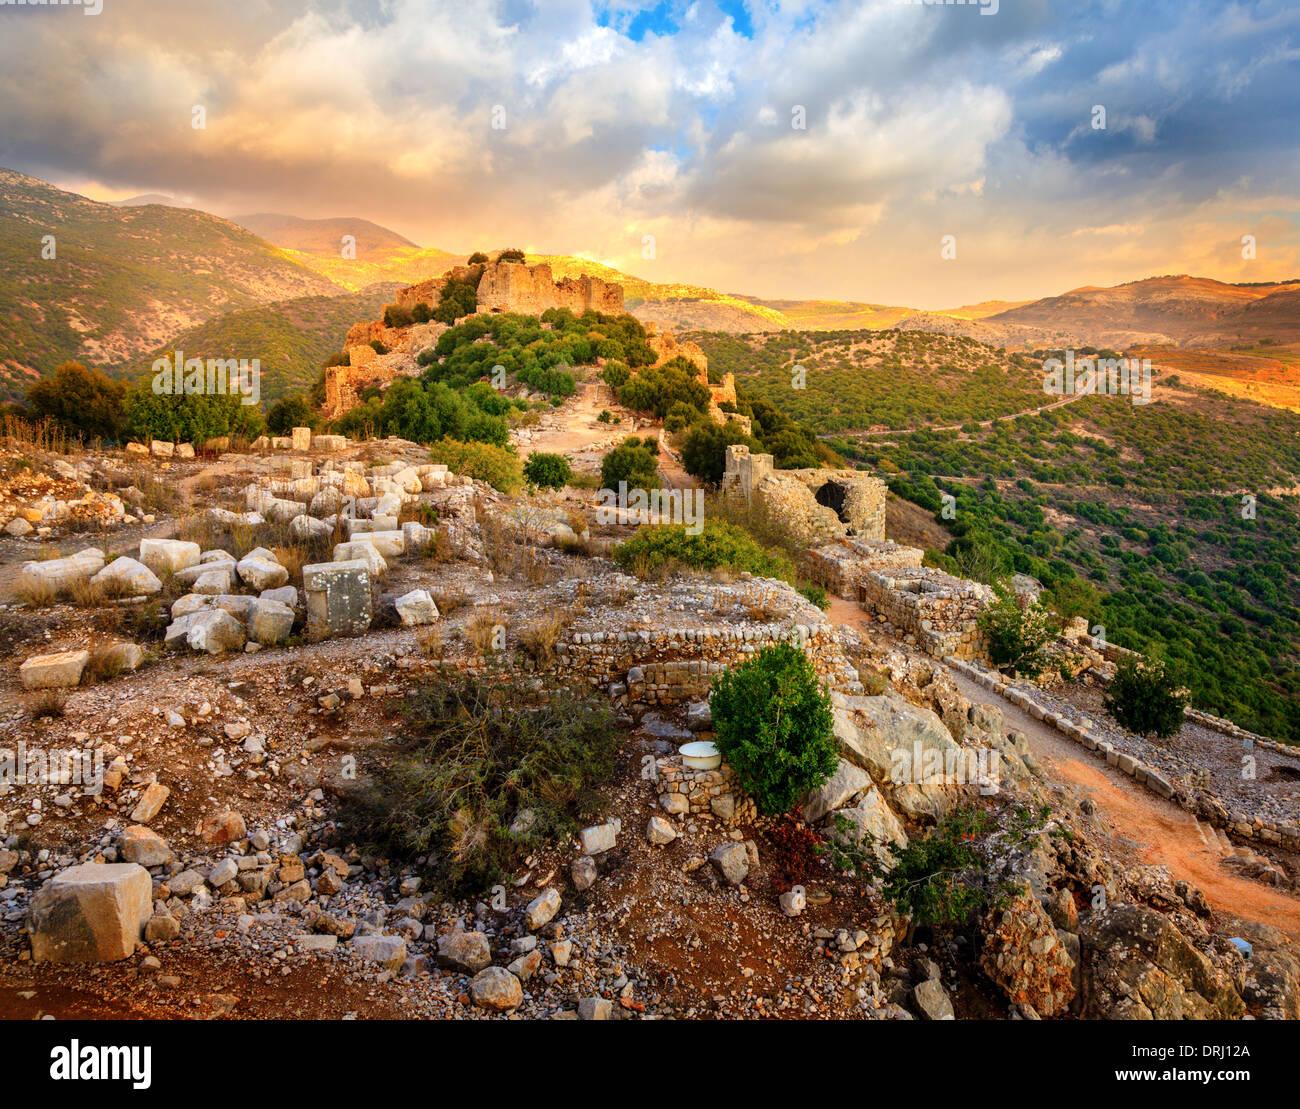 Castle Nimrod in Israel - Stock Image